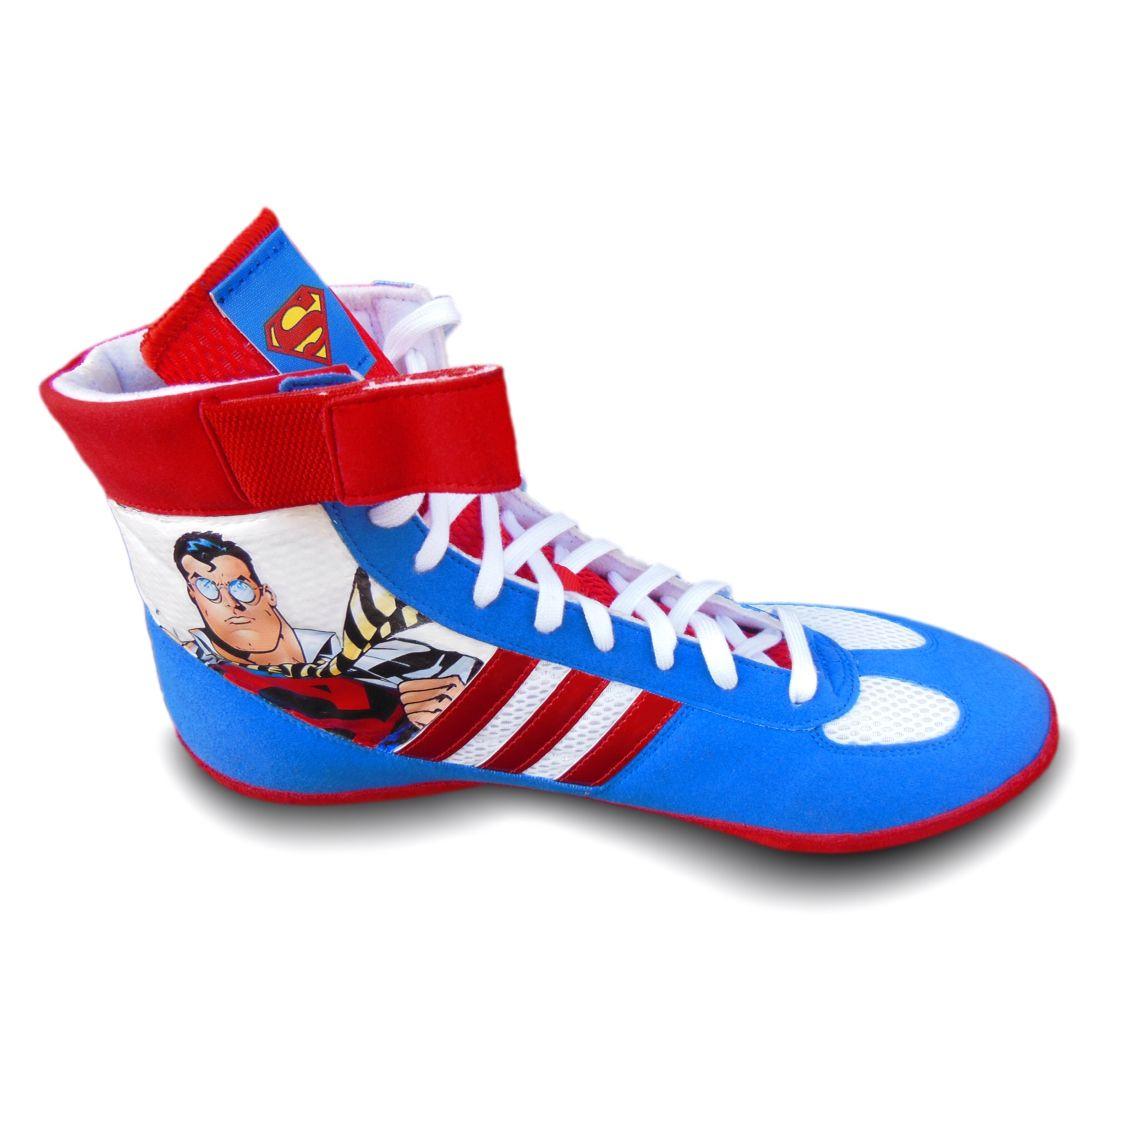 71e3c0d37 Custom wrestling shoes